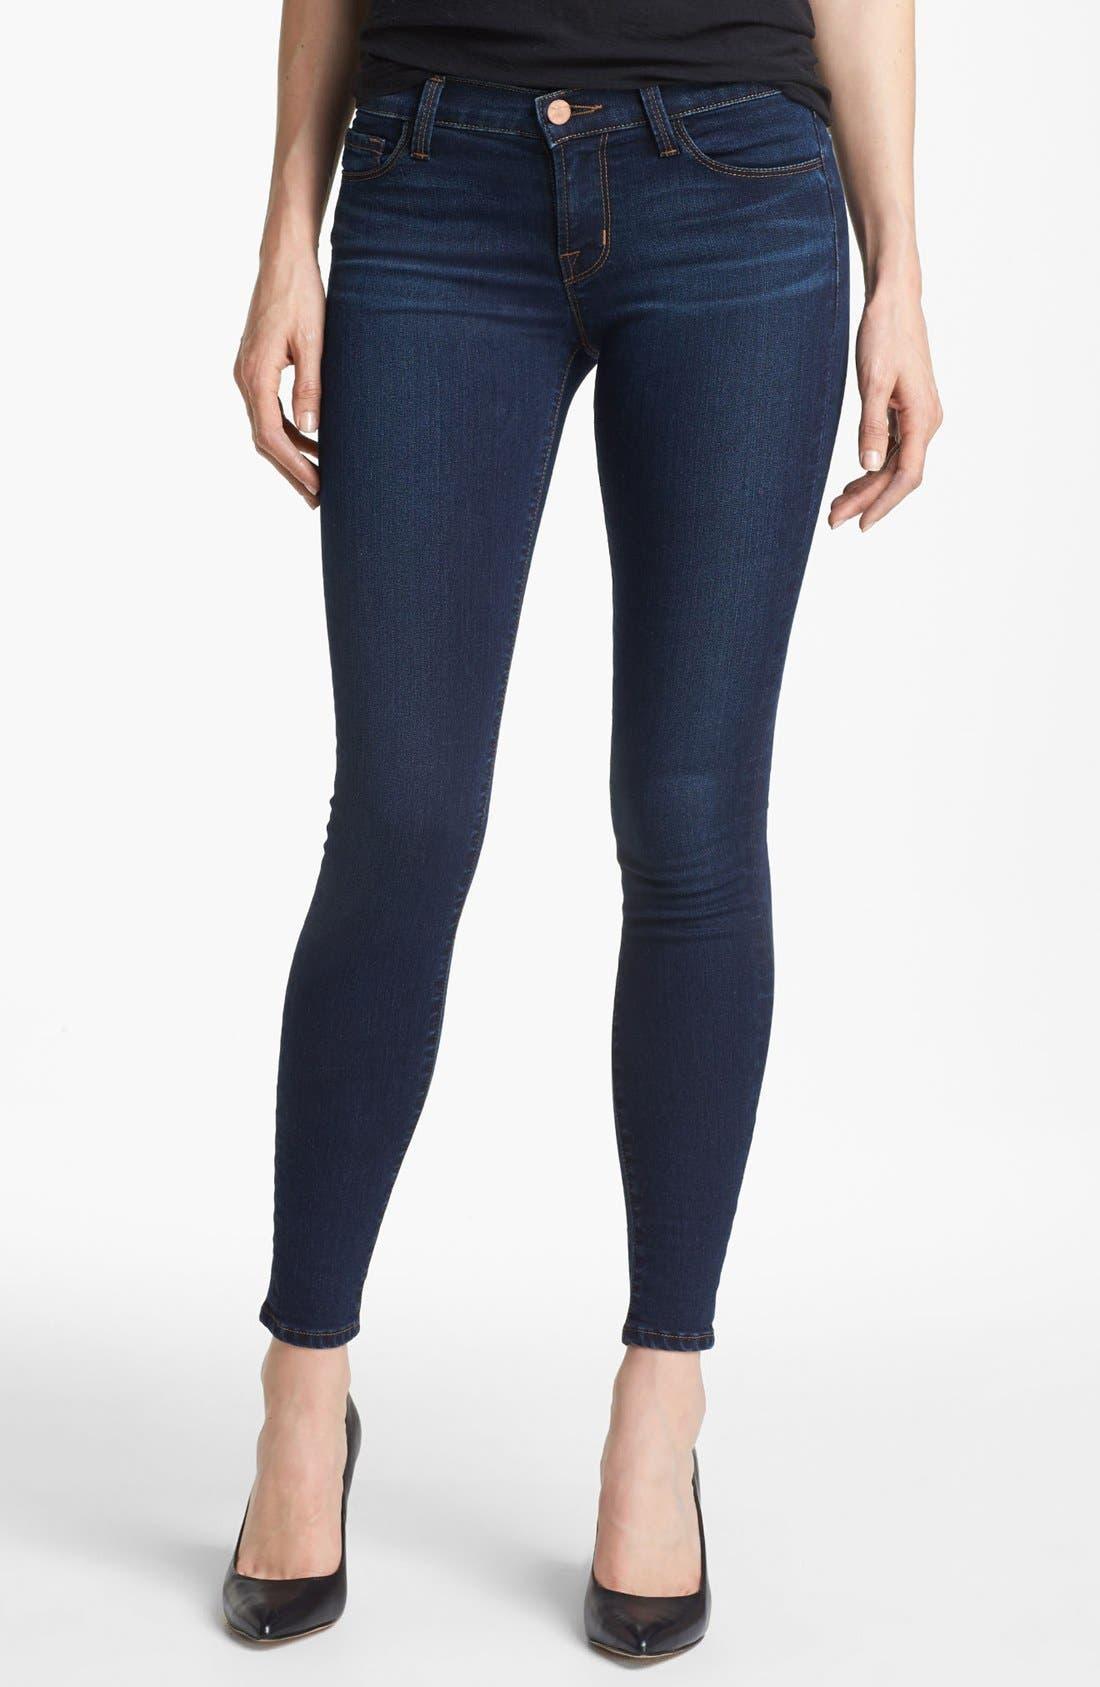 Alternate Image 1 Selected - J Brand '811' Skinny Stretch Jeans (Umber)